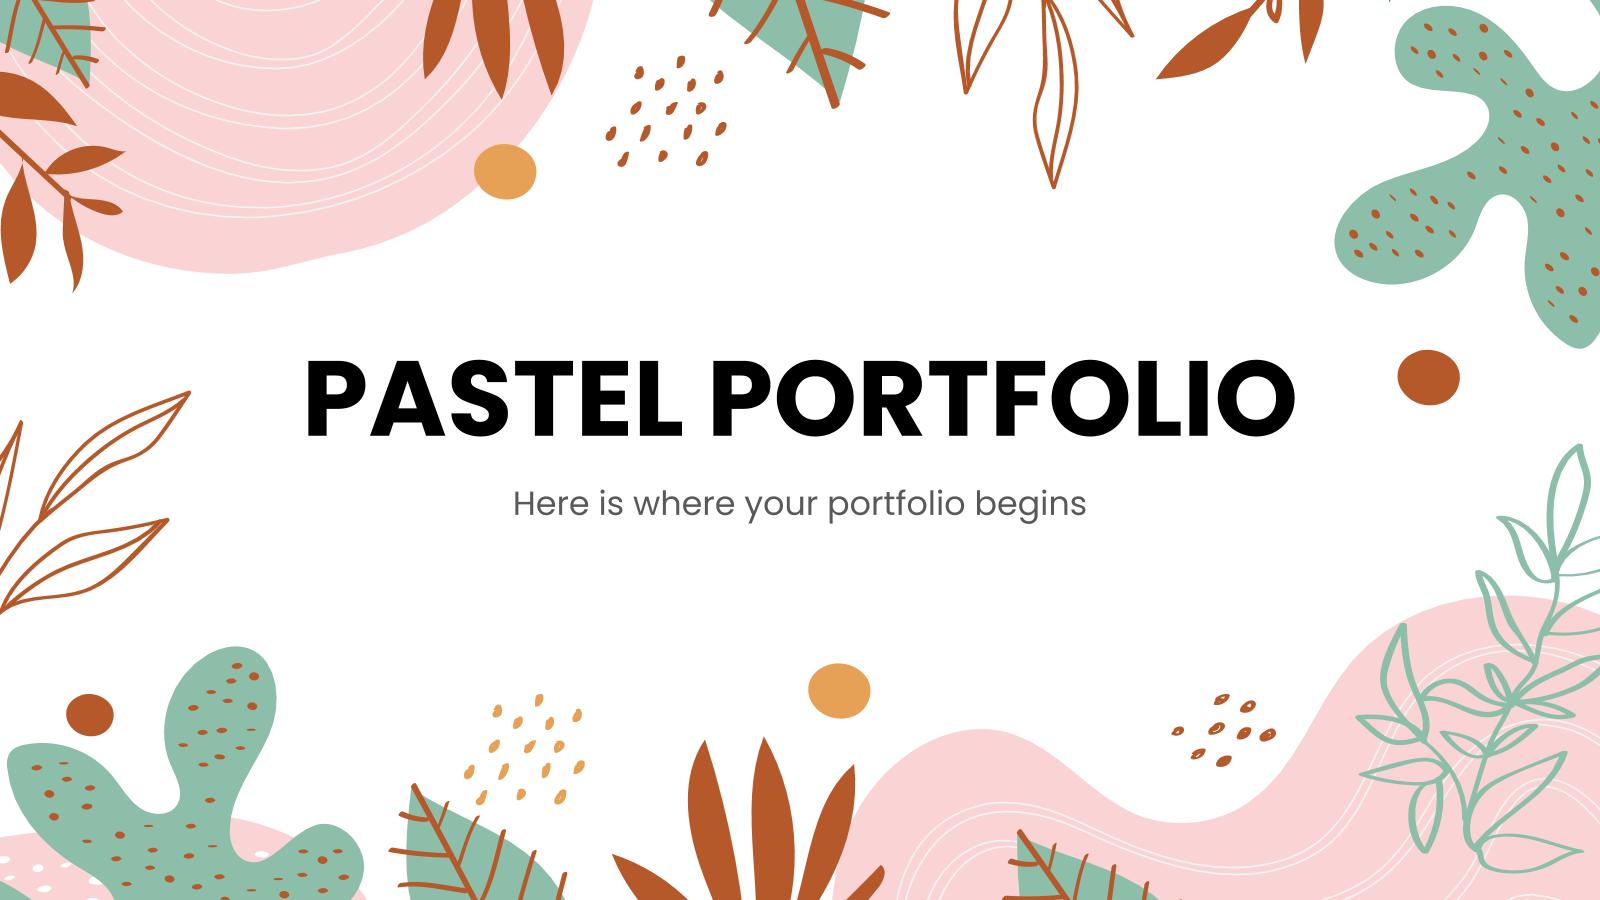 Pastel Portfolio presentation template